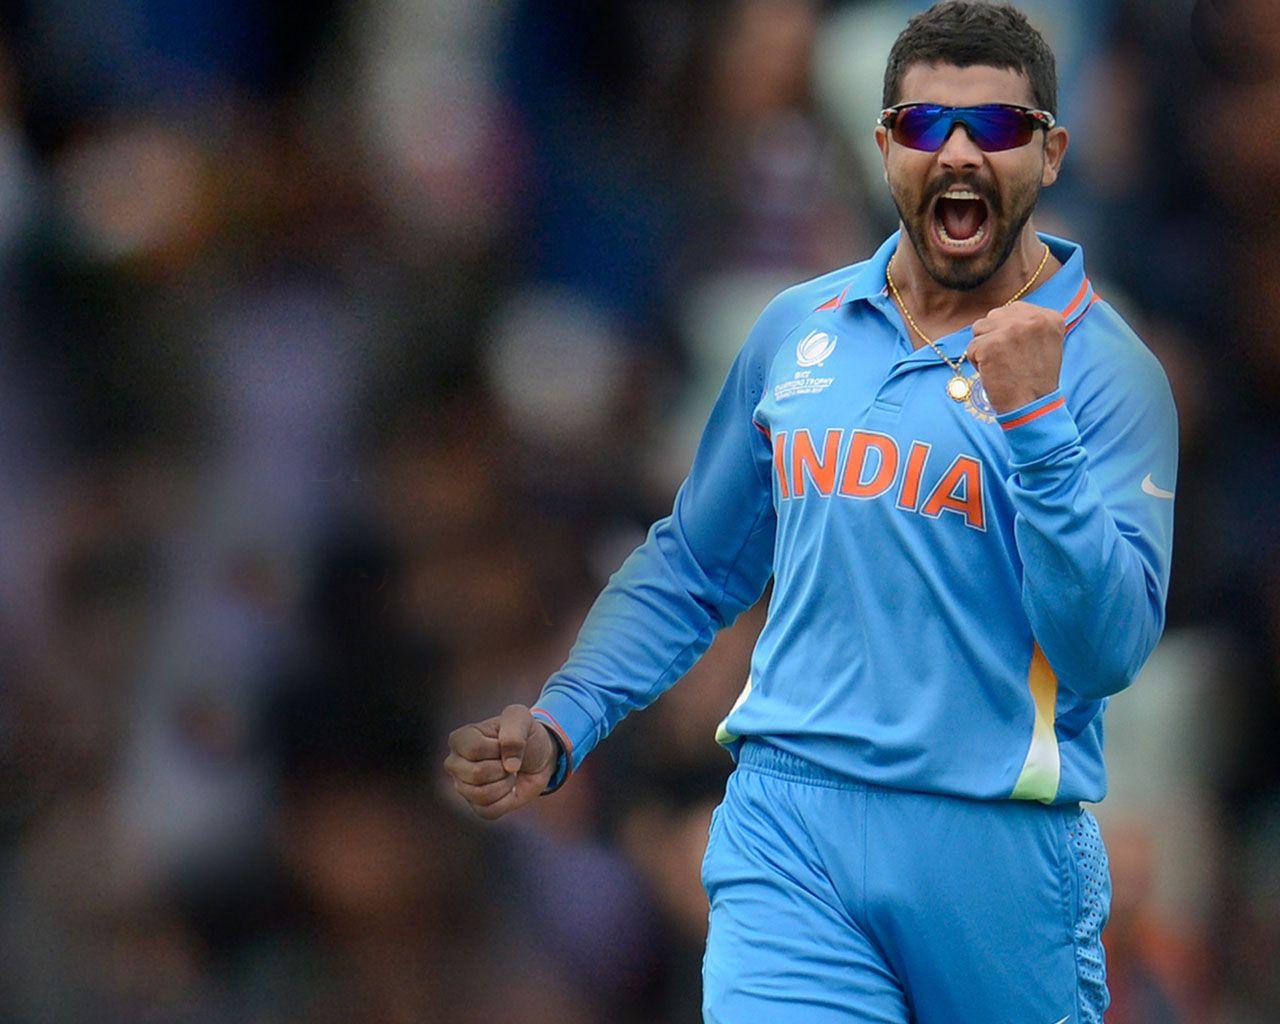 Ravindra Jadeja Indian Cricketer Hd Wallpaper Indian Cricketer